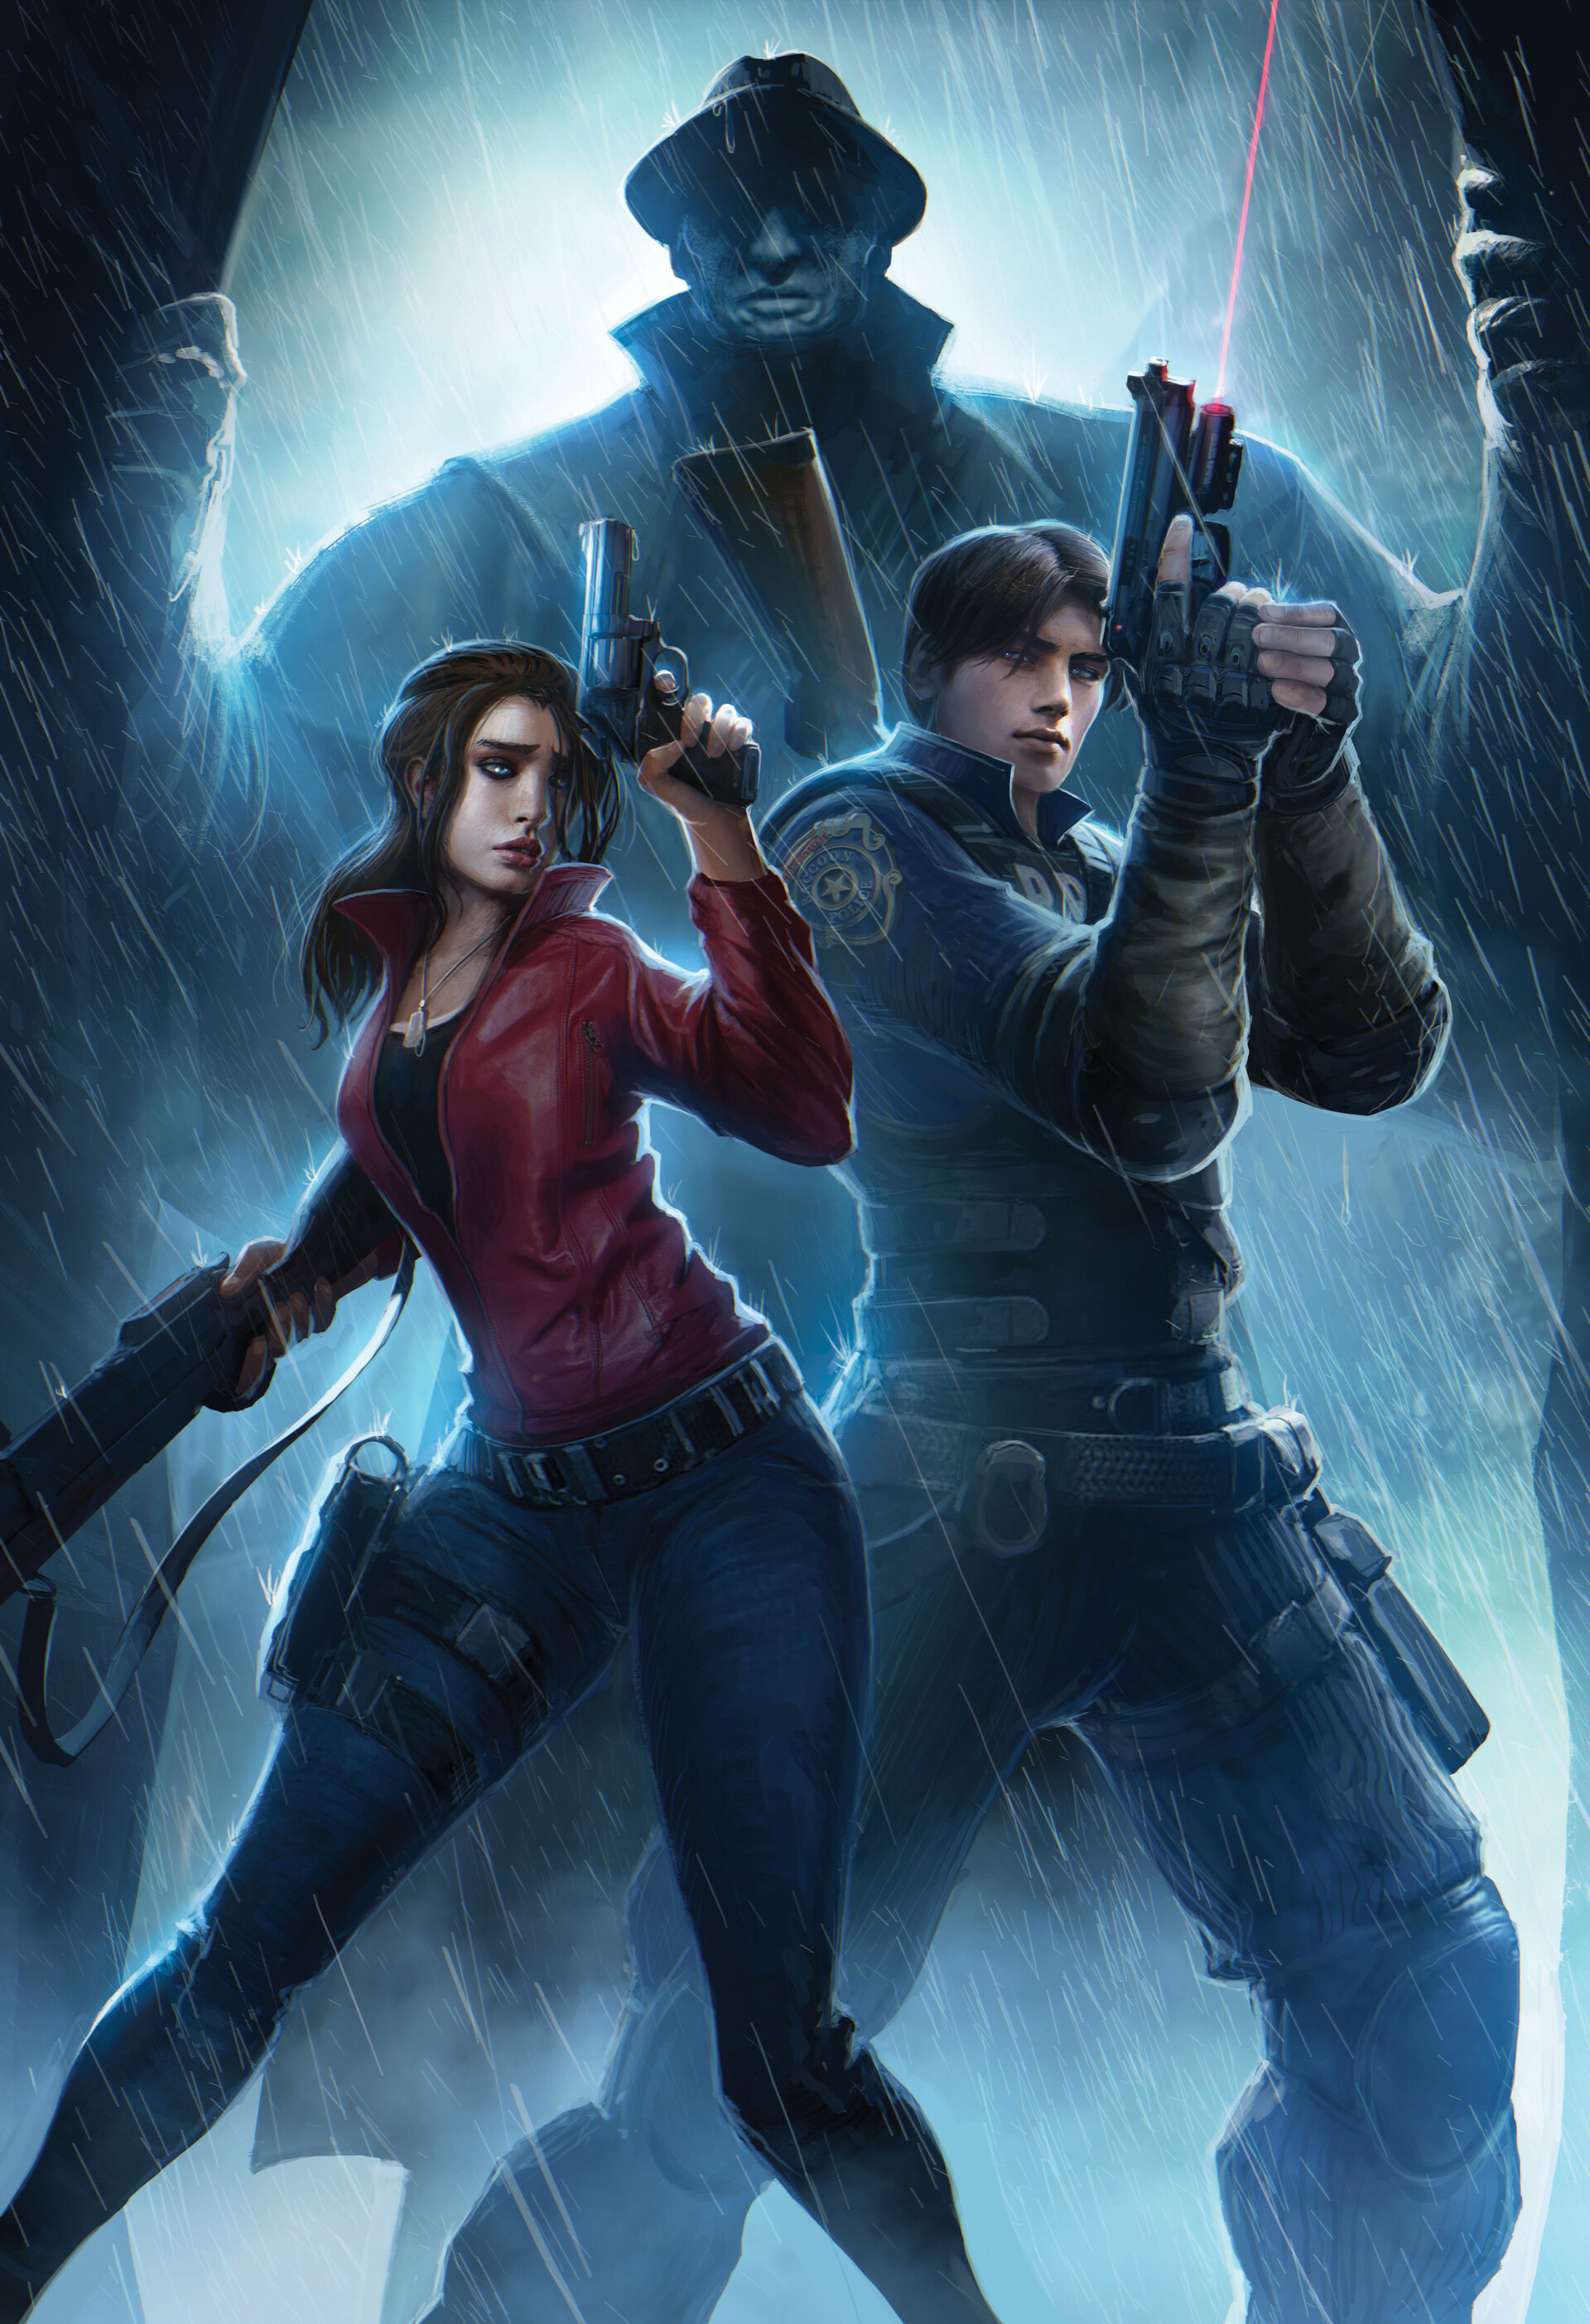 Resident Evil 2 Game Poster Wallpaper Hd Games 4k Wallpapers